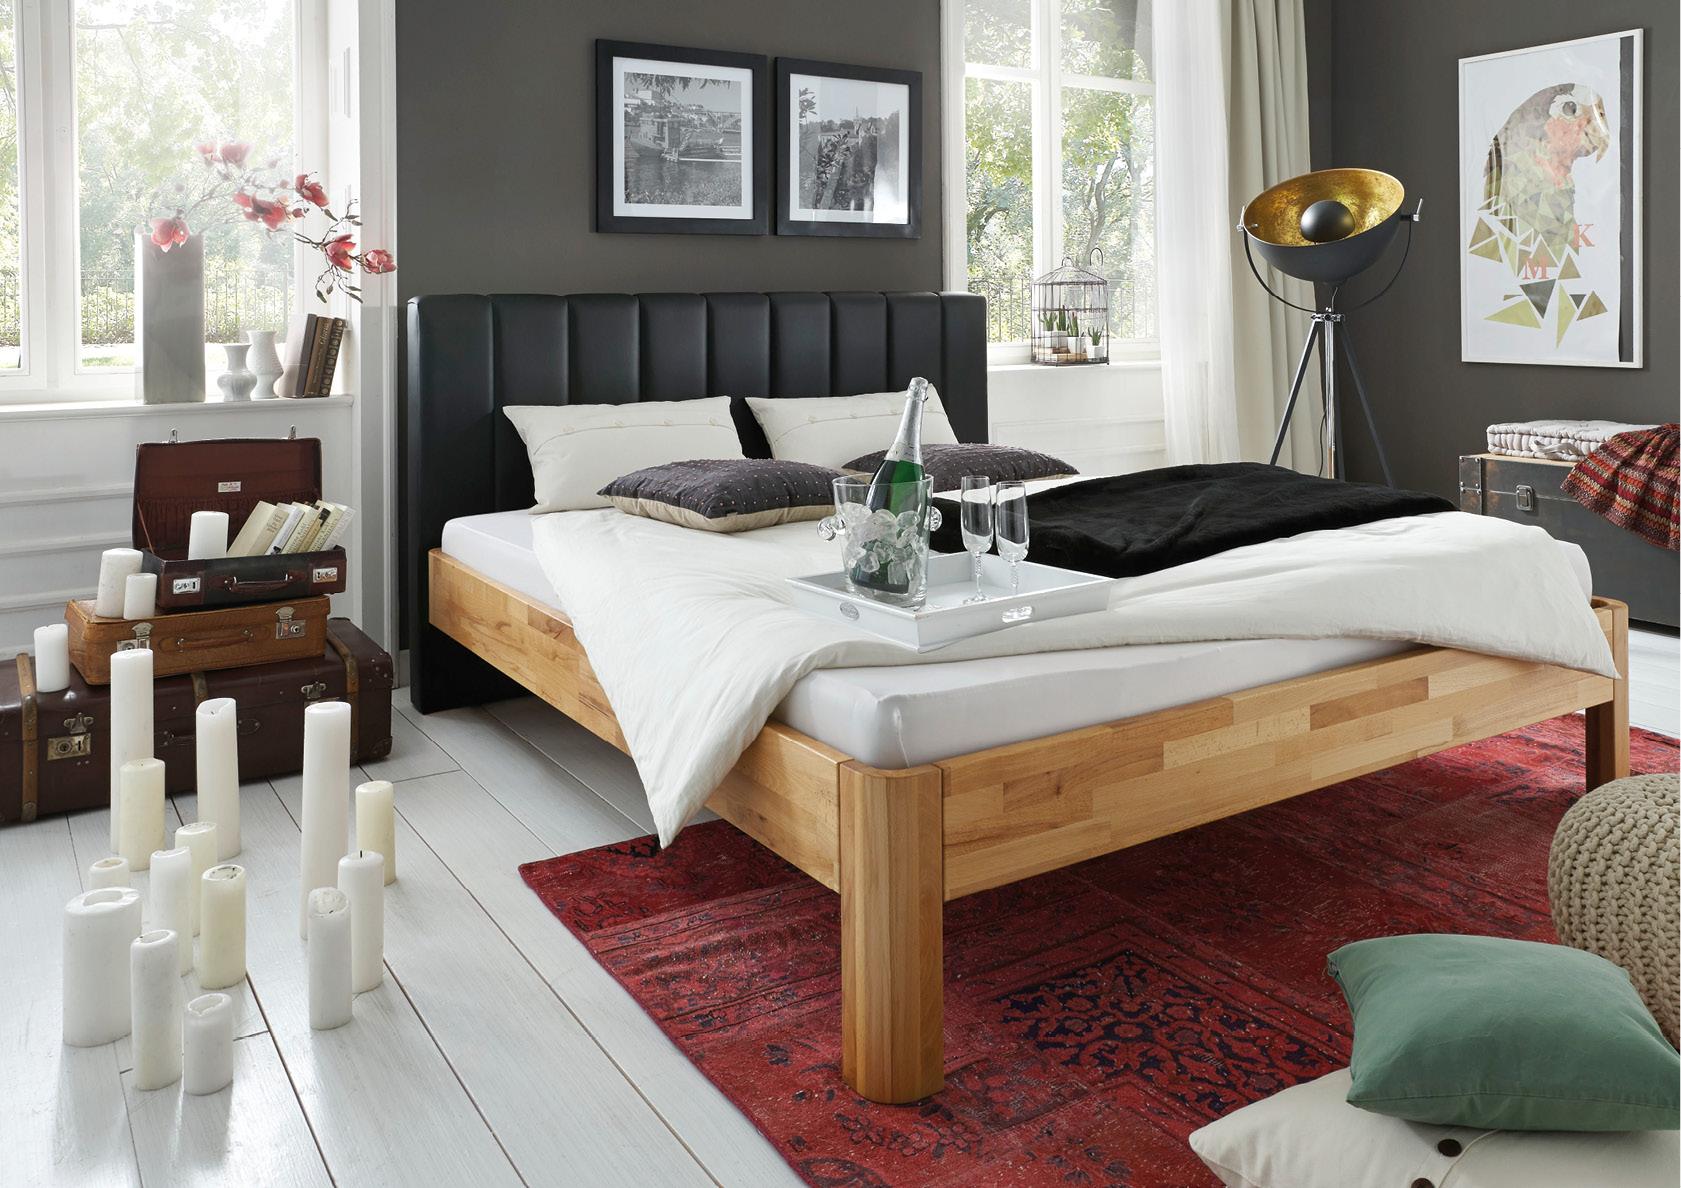 betten m bel bohn gmbh in hilchenbach m sen. Black Bedroom Furniture Sets. Home Design Ideas